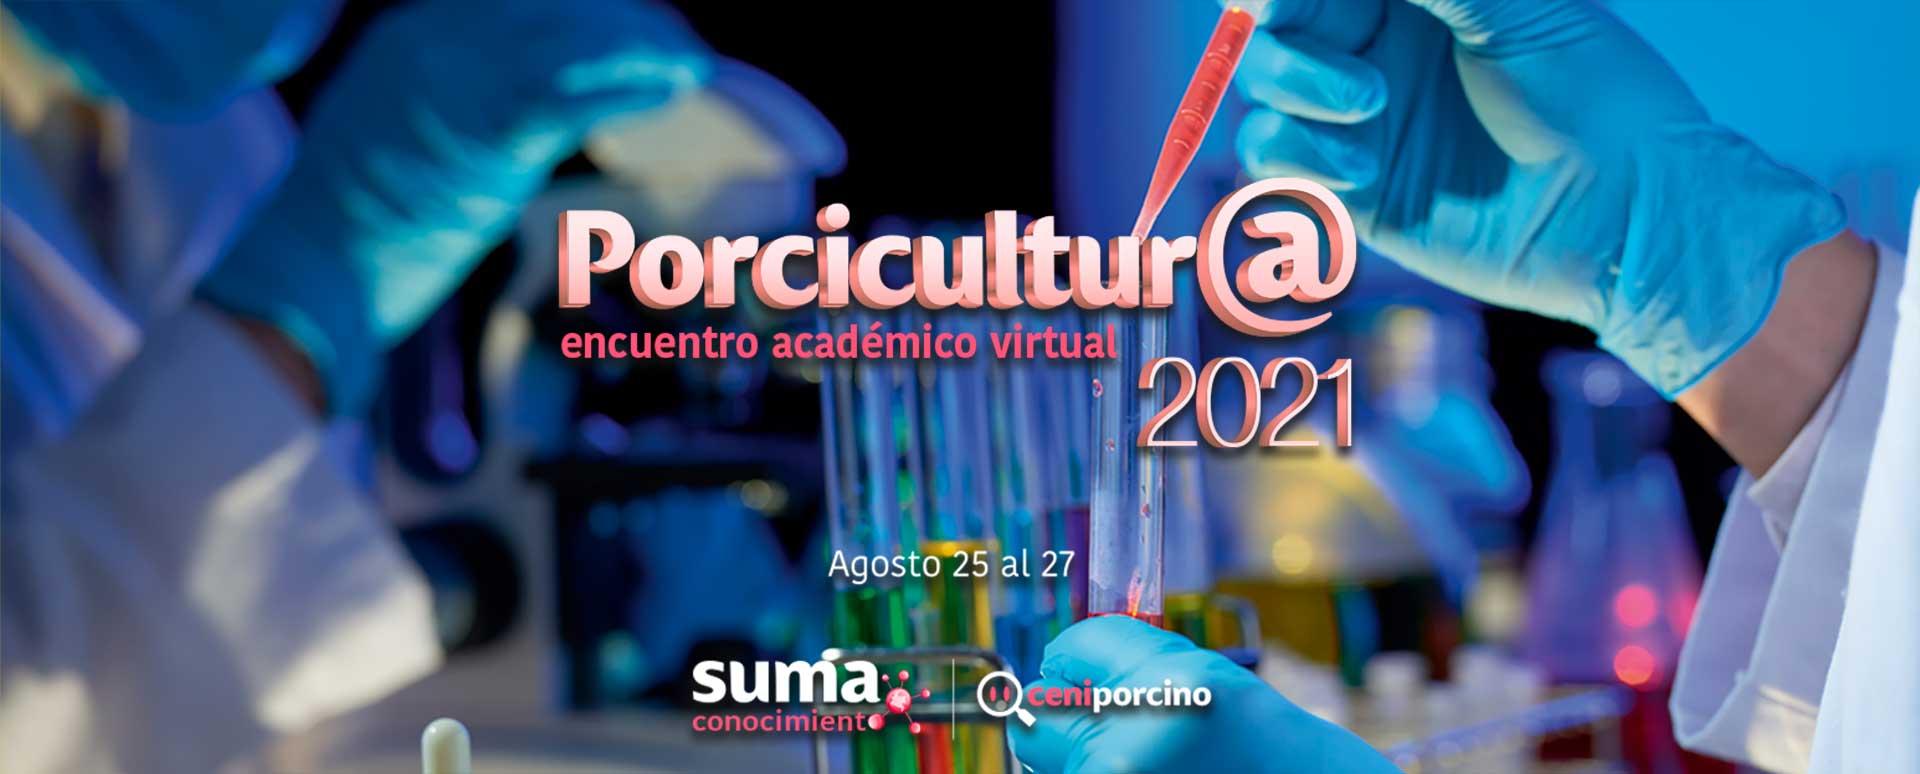 https://www.porkcolombia.co/wp-content/uploads/2021/06/SUMA-1280-X-623-LABORATORIO.jpg